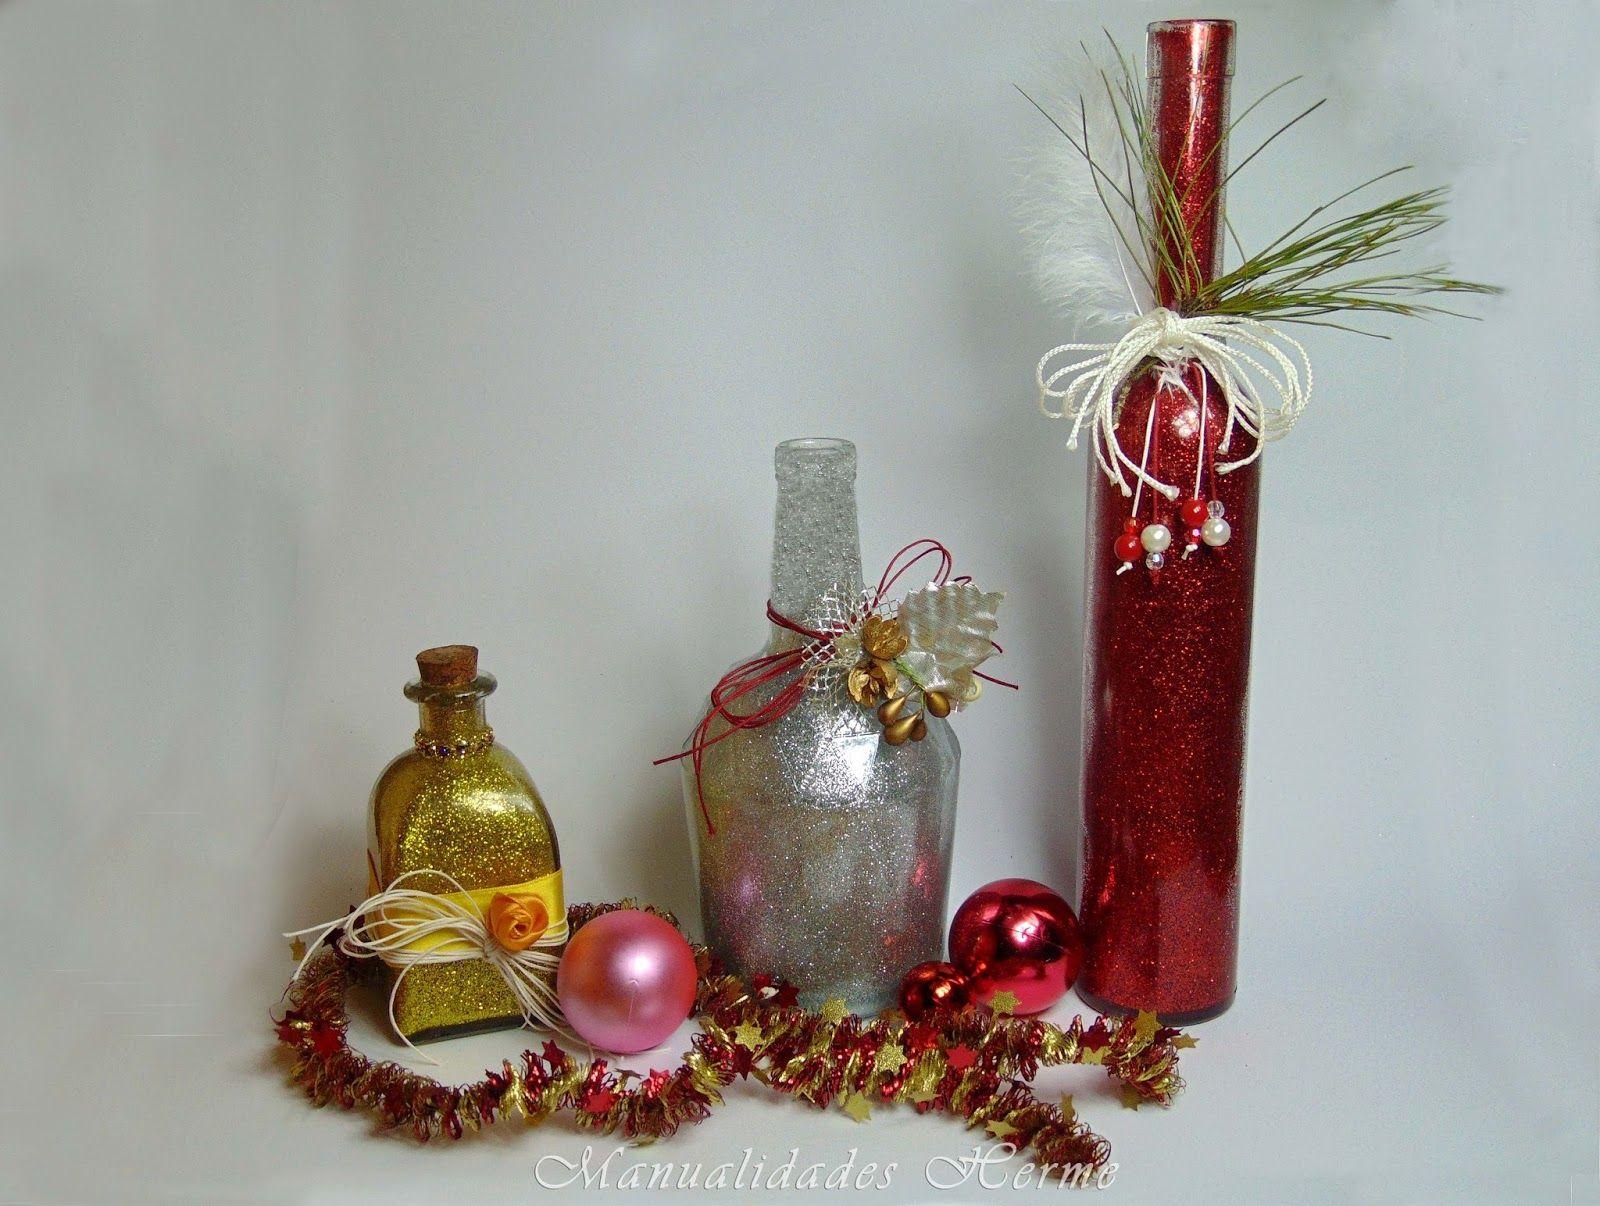 Manualidades herme diy botella decorada para navidad - Manualidades de navidad ...